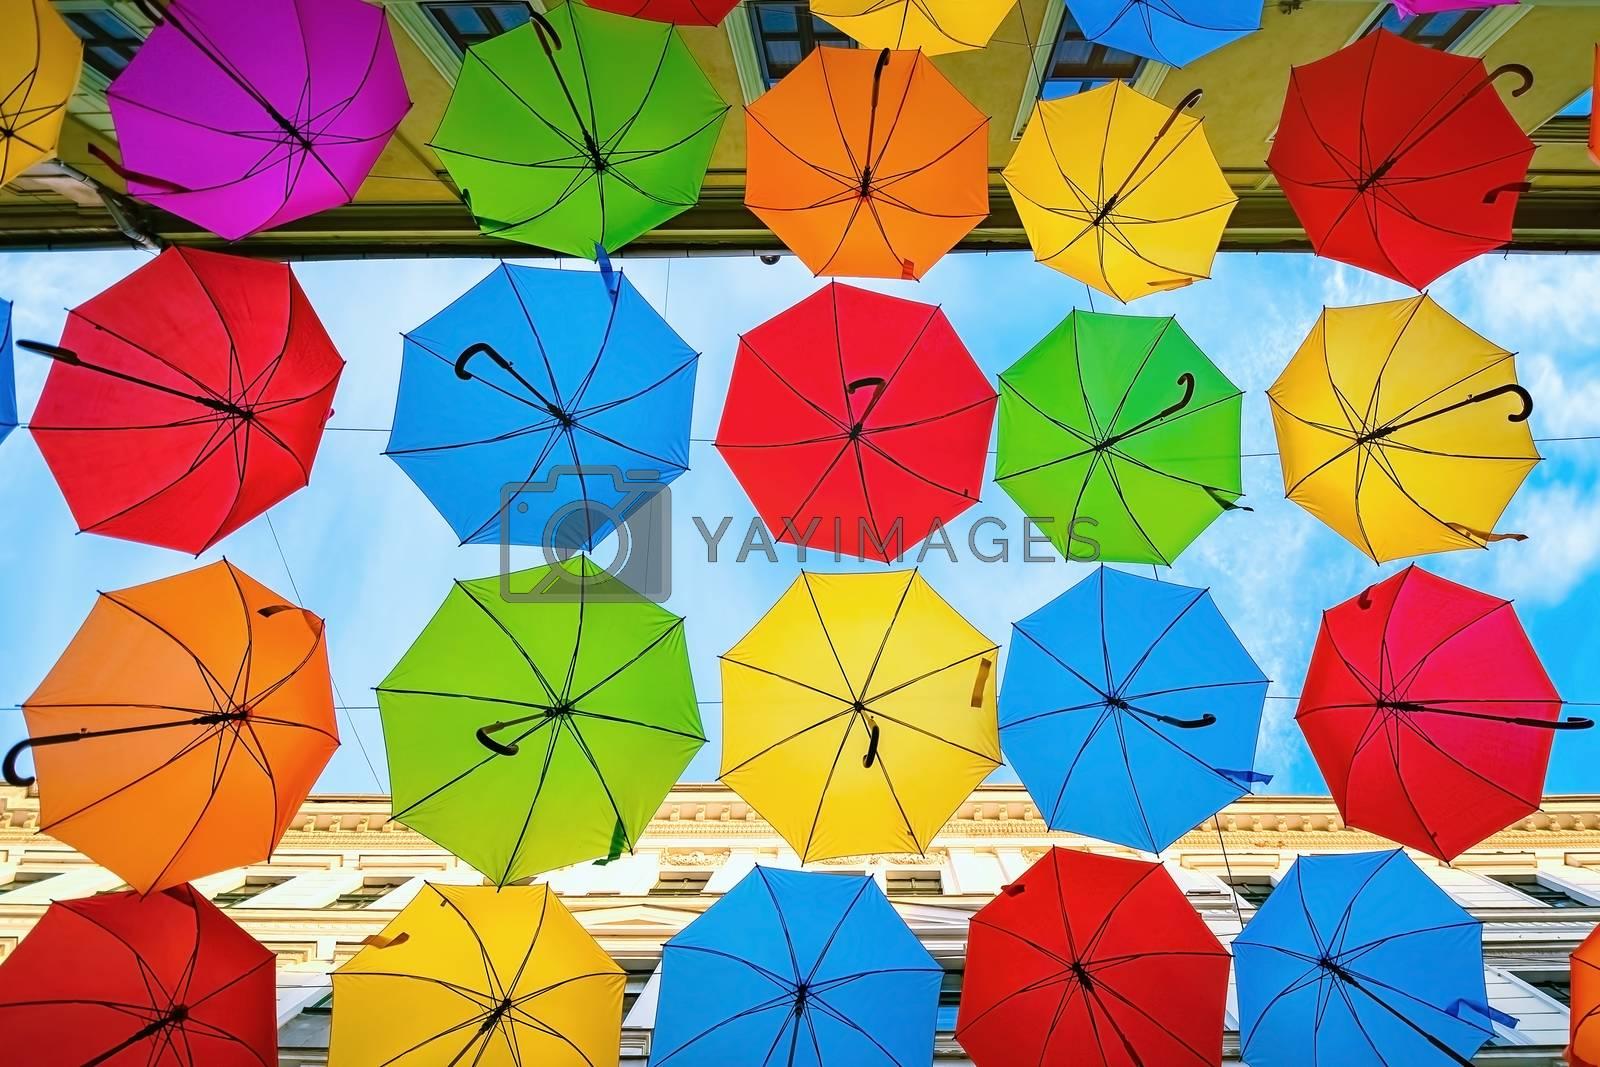 Umbrella street (Alba Iulia street) in Timisoara, Romania